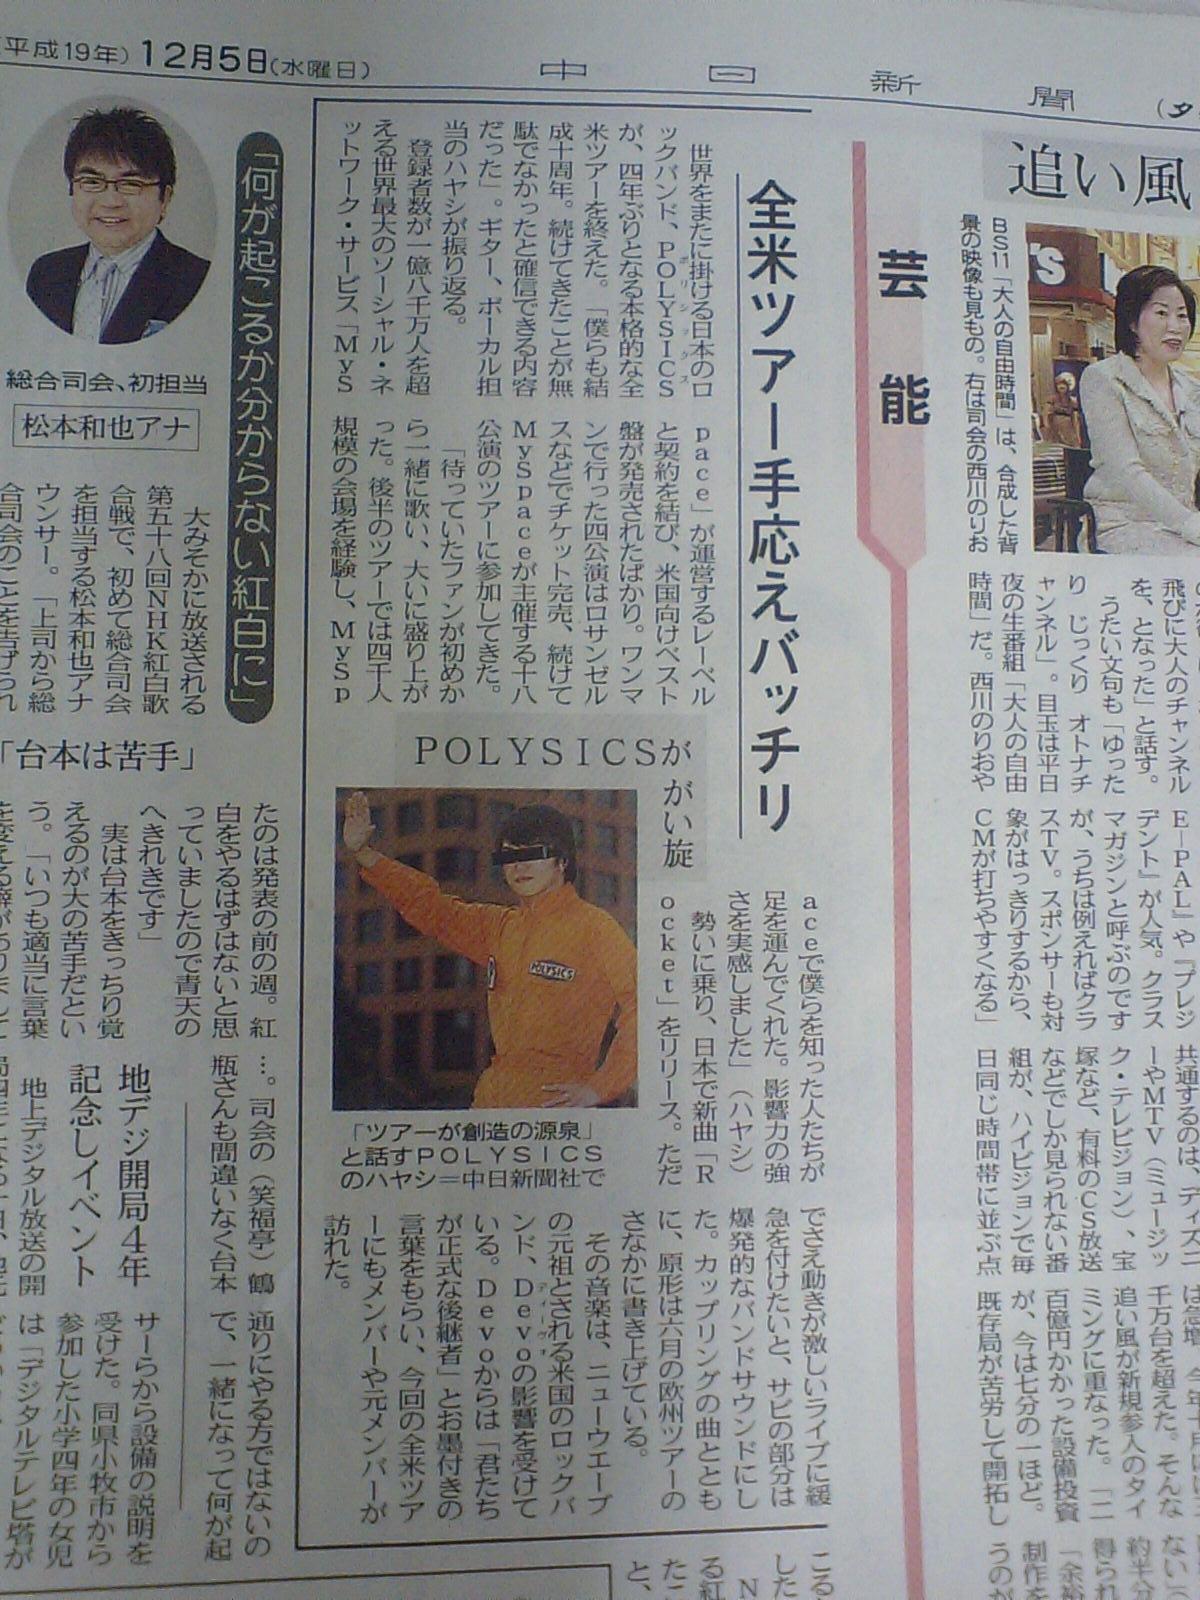 POLYSICS 20071205中日新聞夕刊